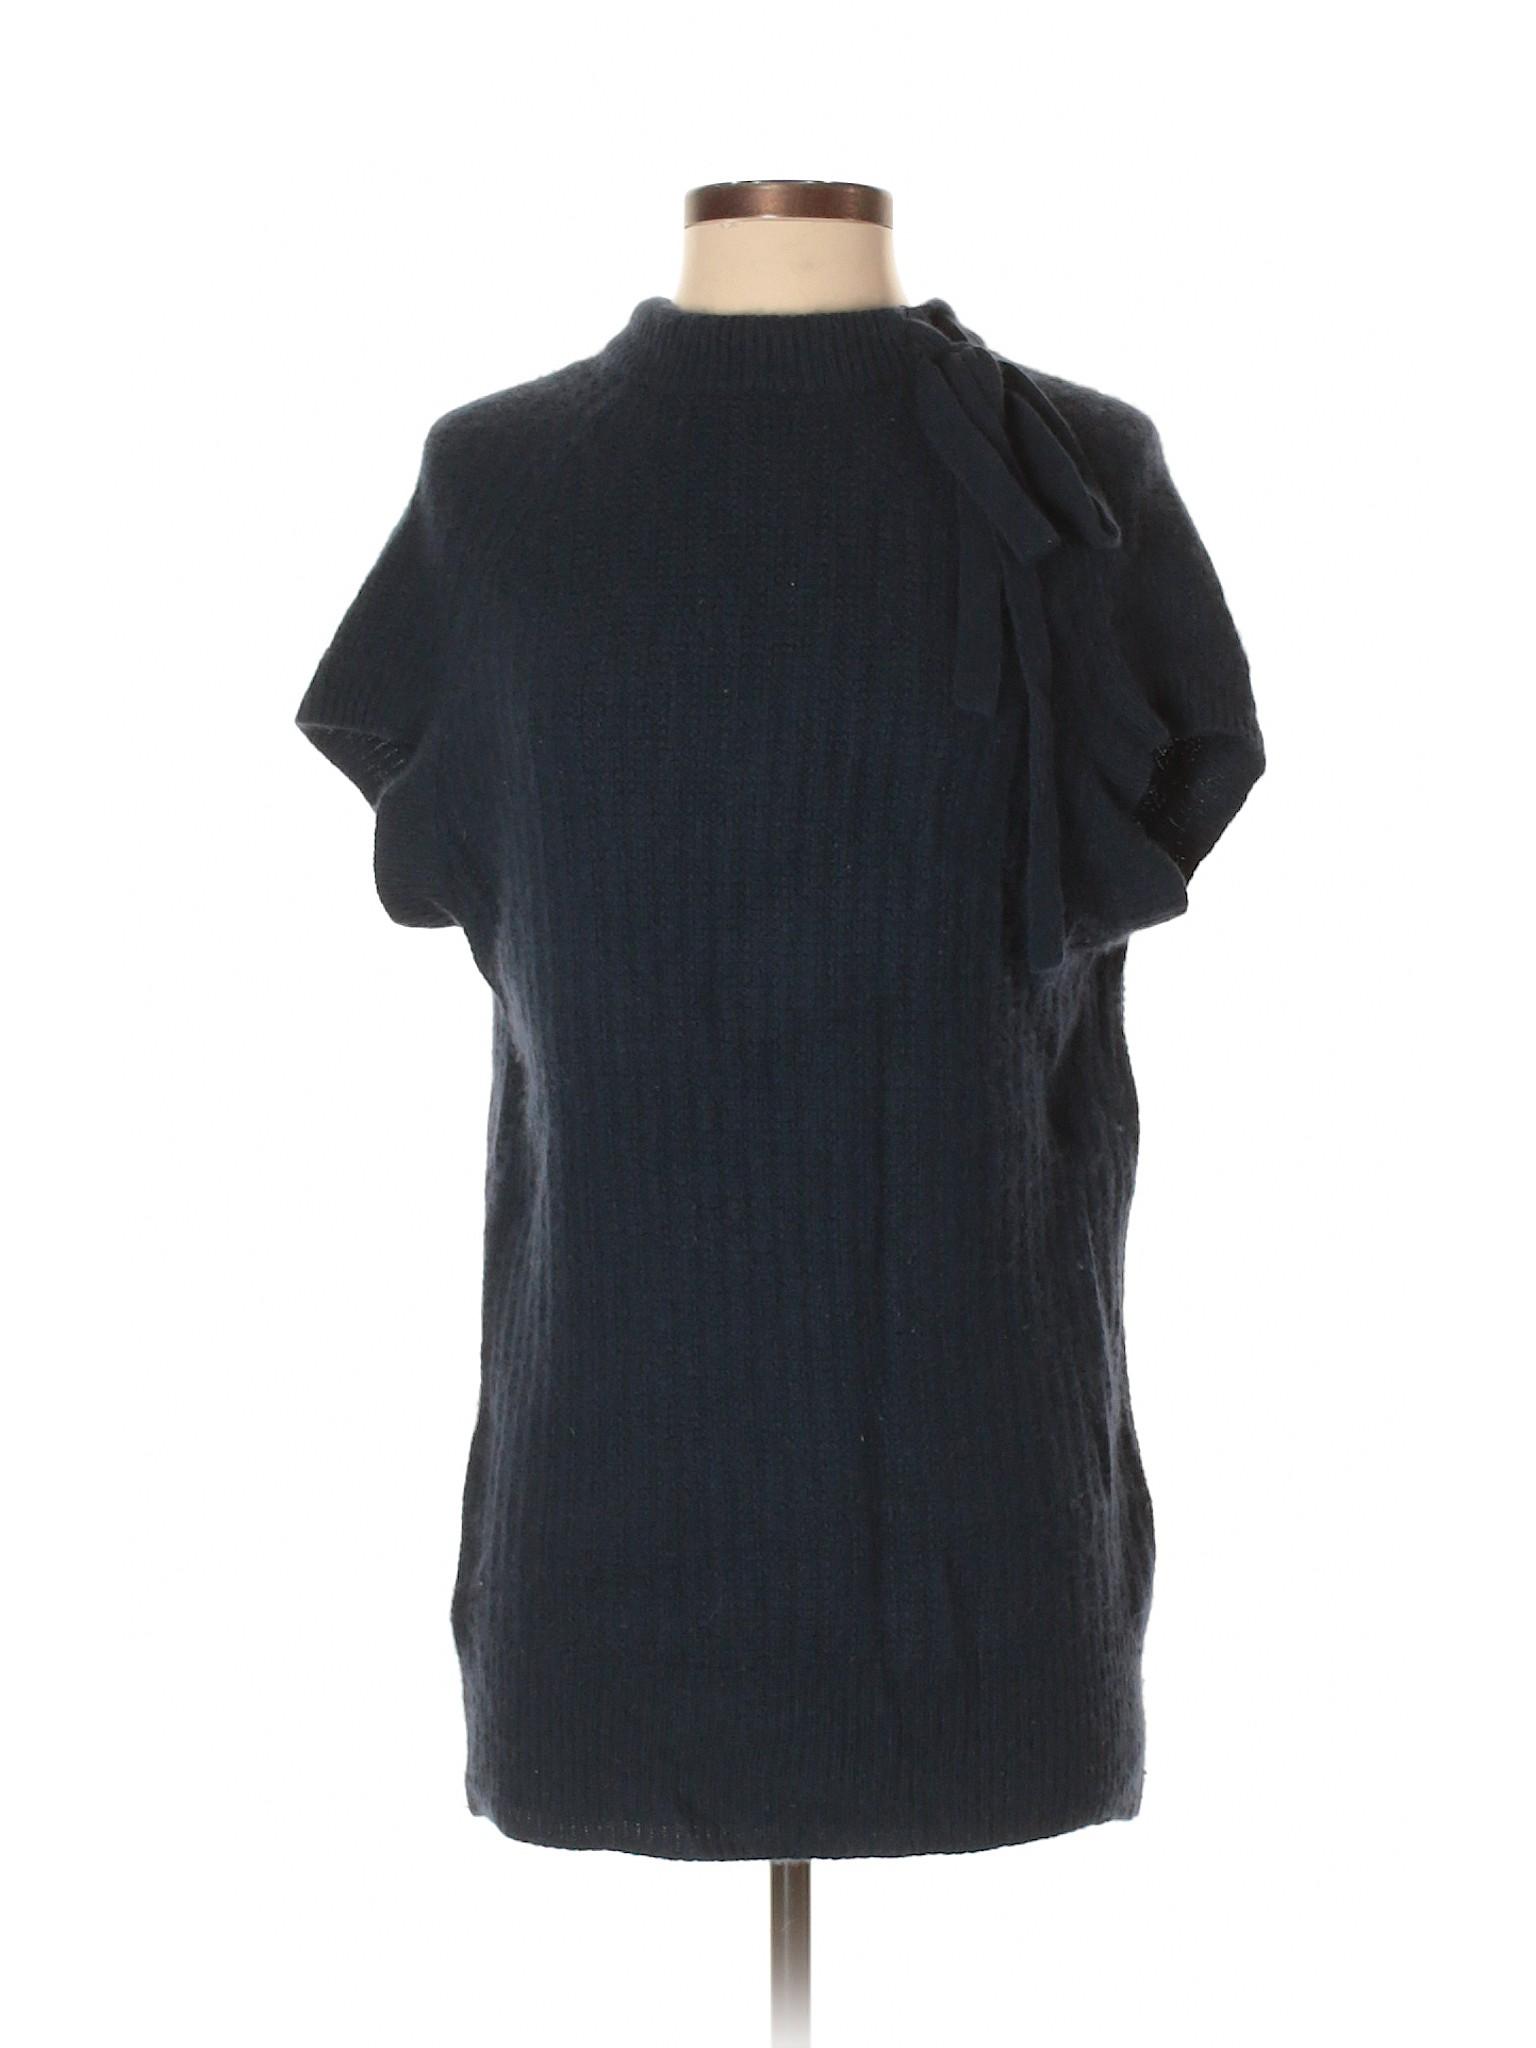 Boutique Sweater BCBGMAXAZRIA Wool BCBGMAXAZRIA BCBGMAXAZRIA Wool Sweater Pullover Pullover Boutique Boutique qaCfq7